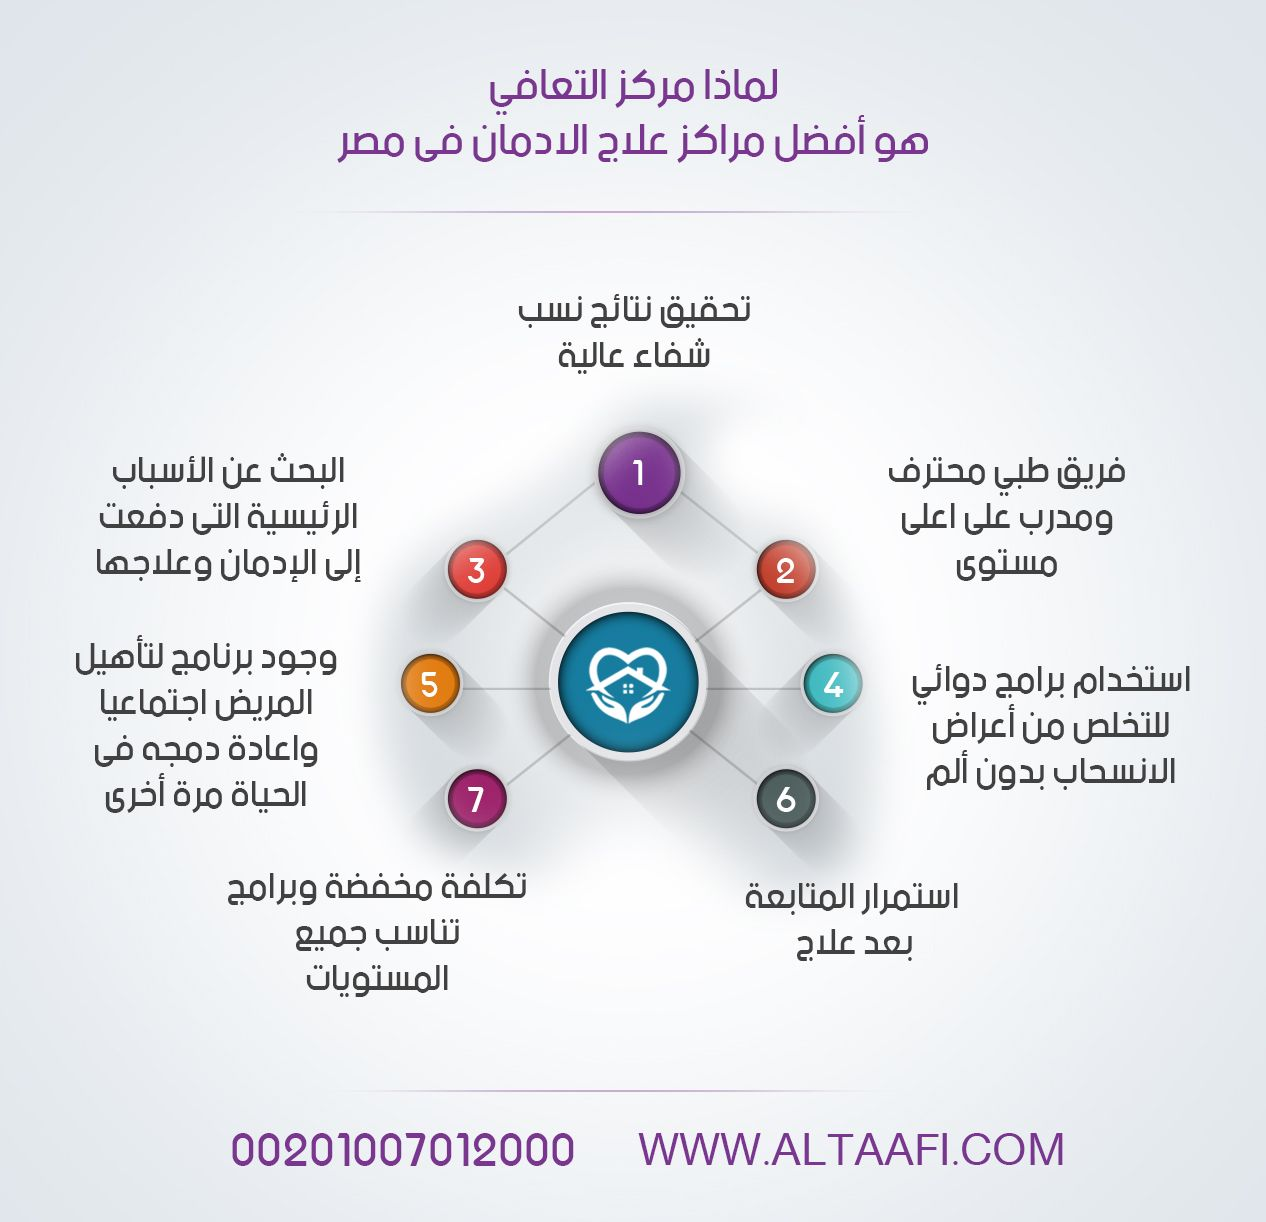 لماذا مركز التعافي هو افضل مراكز علاج الادمان في مصر Convenience Store Products Pill Convenience Store